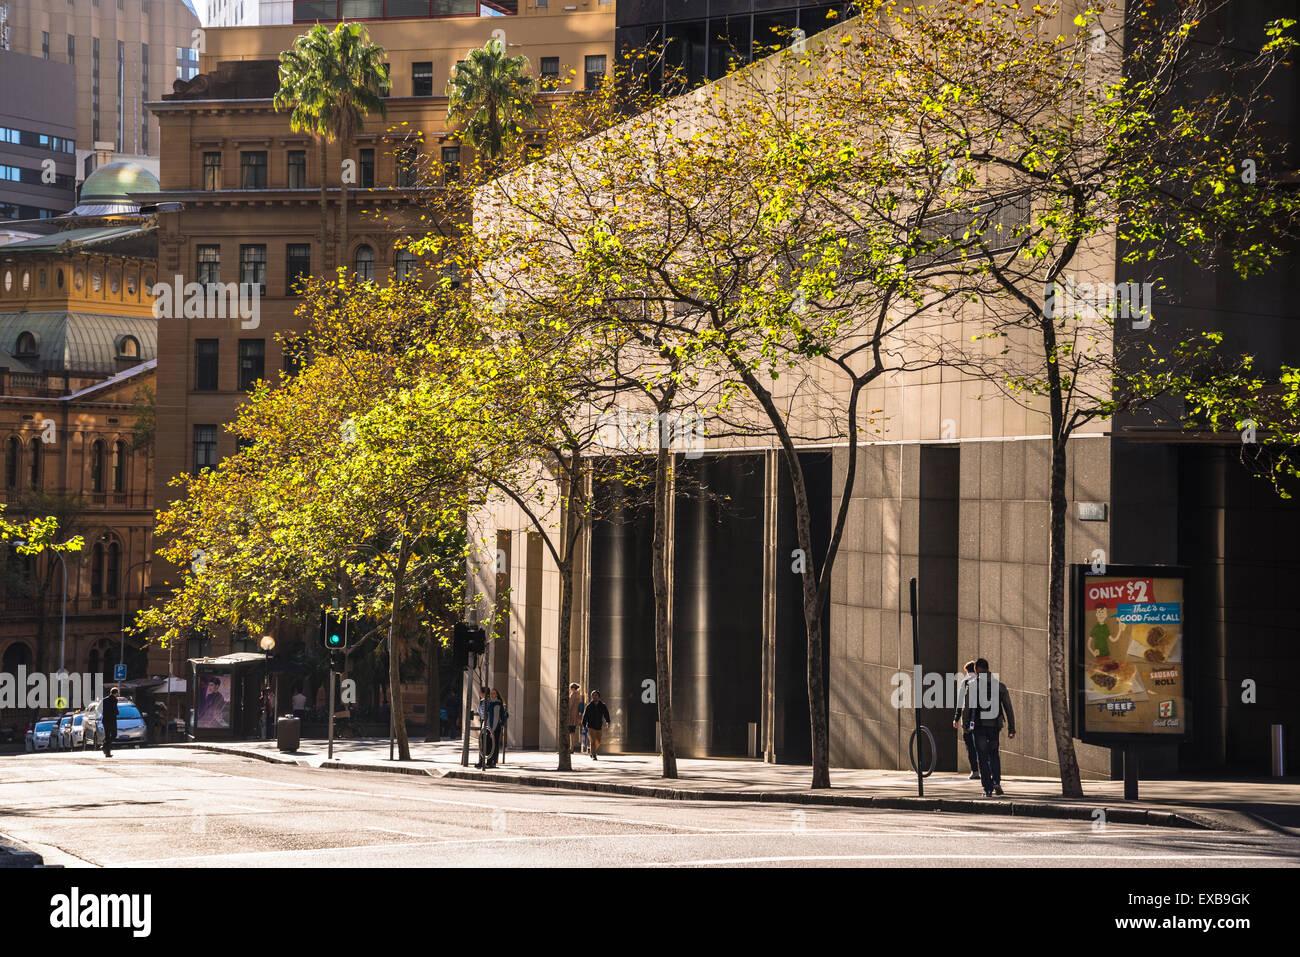 Bent Street, CBD, Sydney, Australia. Imagen De Stock